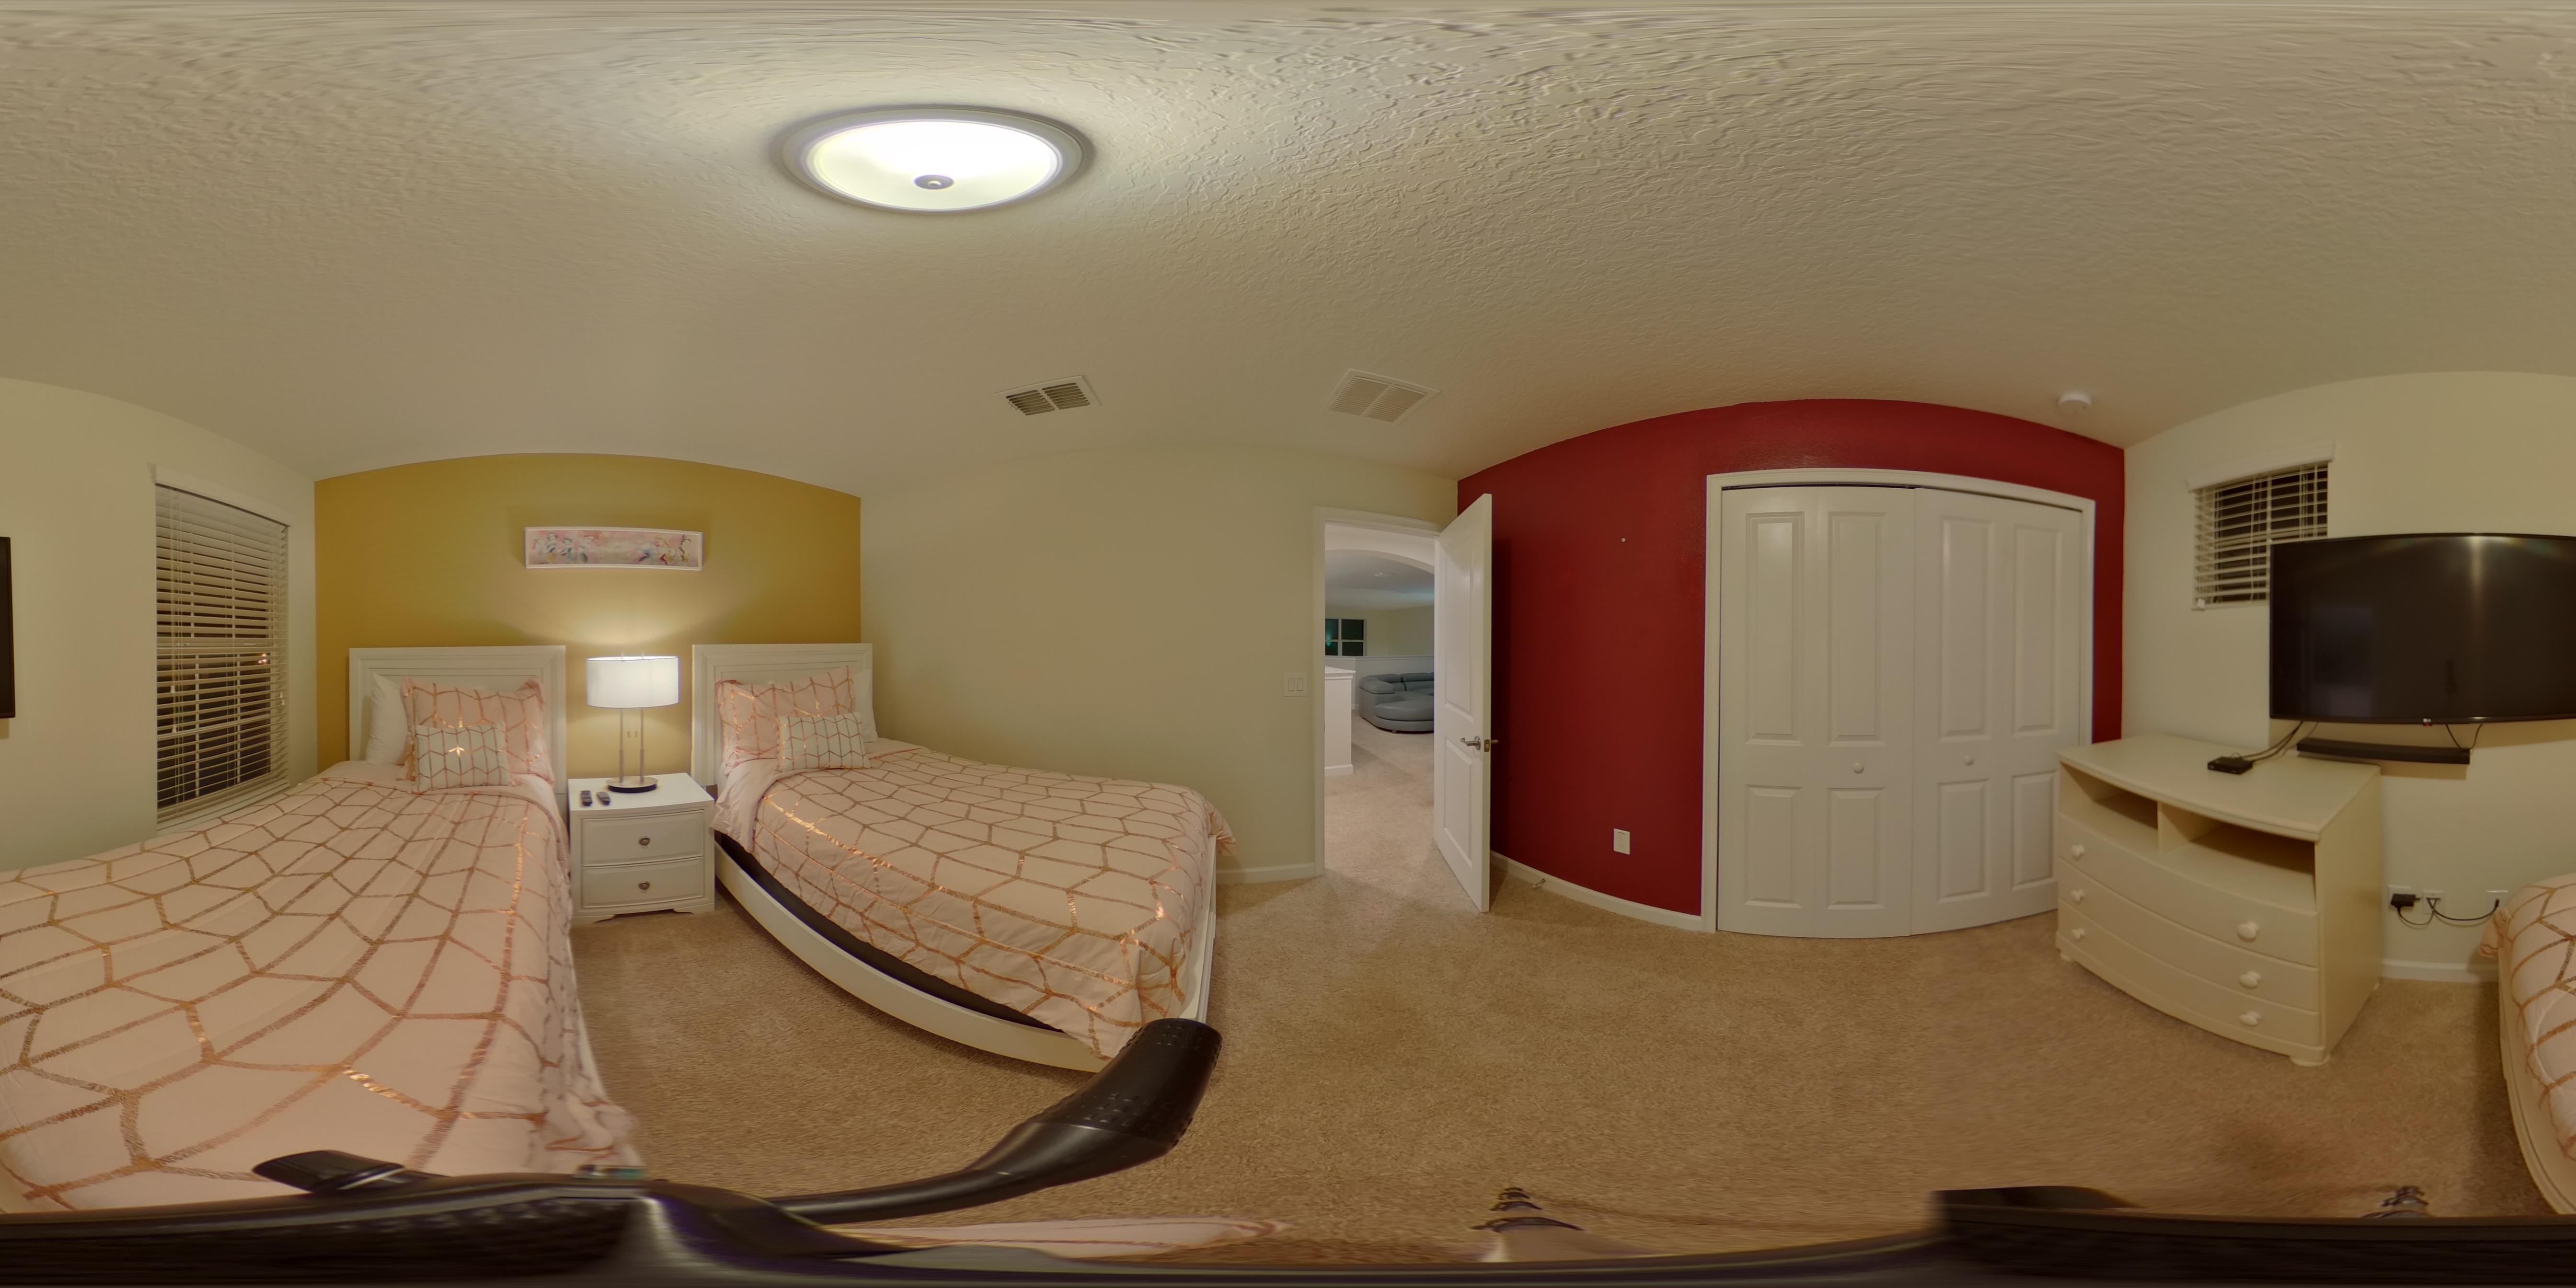 Apartment Villa  10 min from Disney  Golf  Wetpark all new photo 24719400